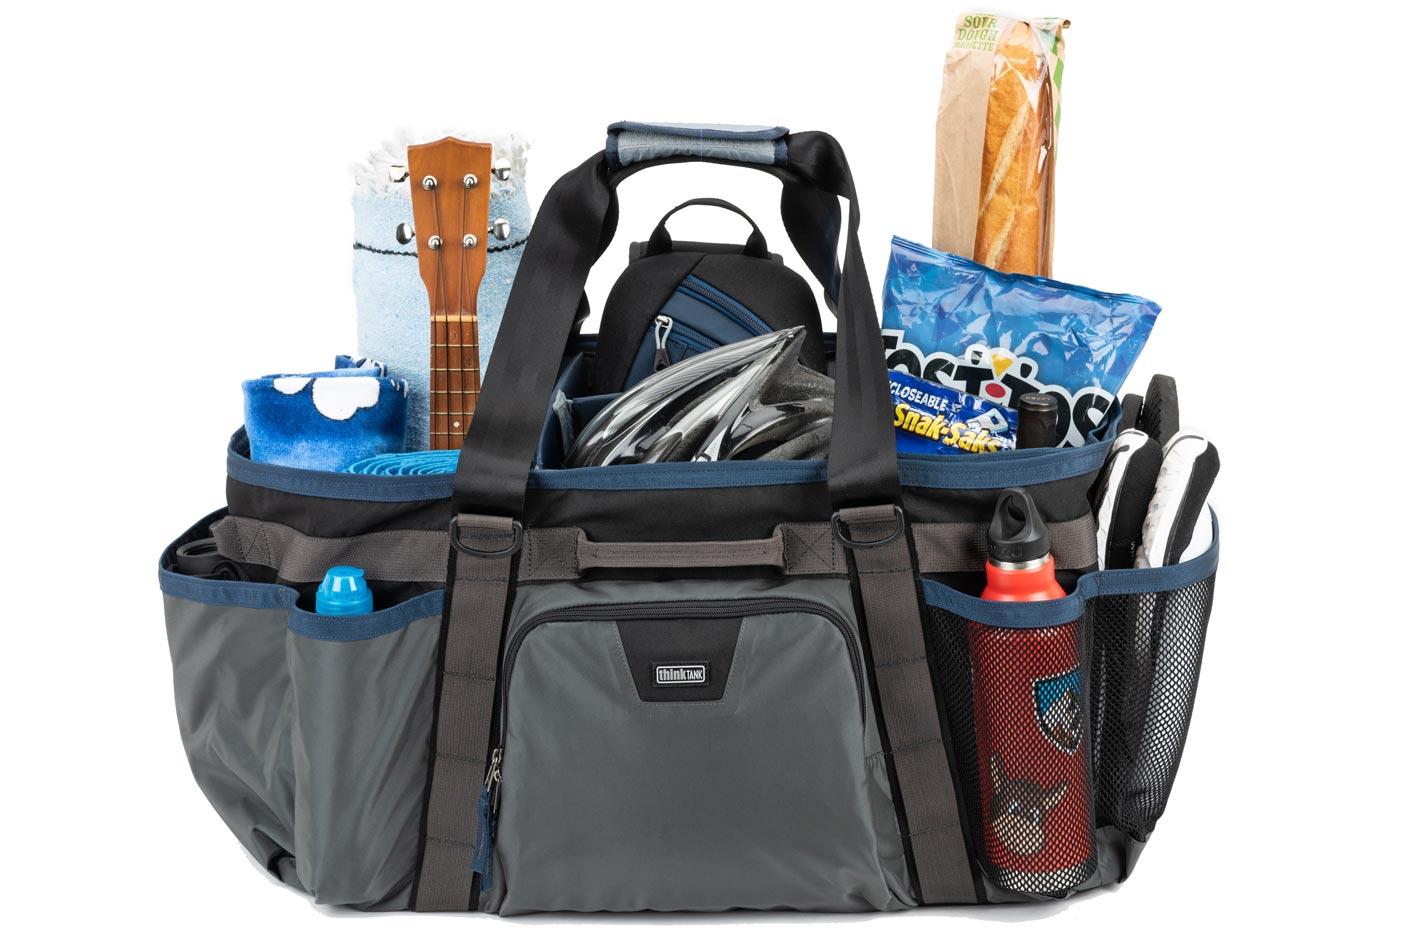 Freeway Longhaul: a carryall duffel bag developed in 8 weeks